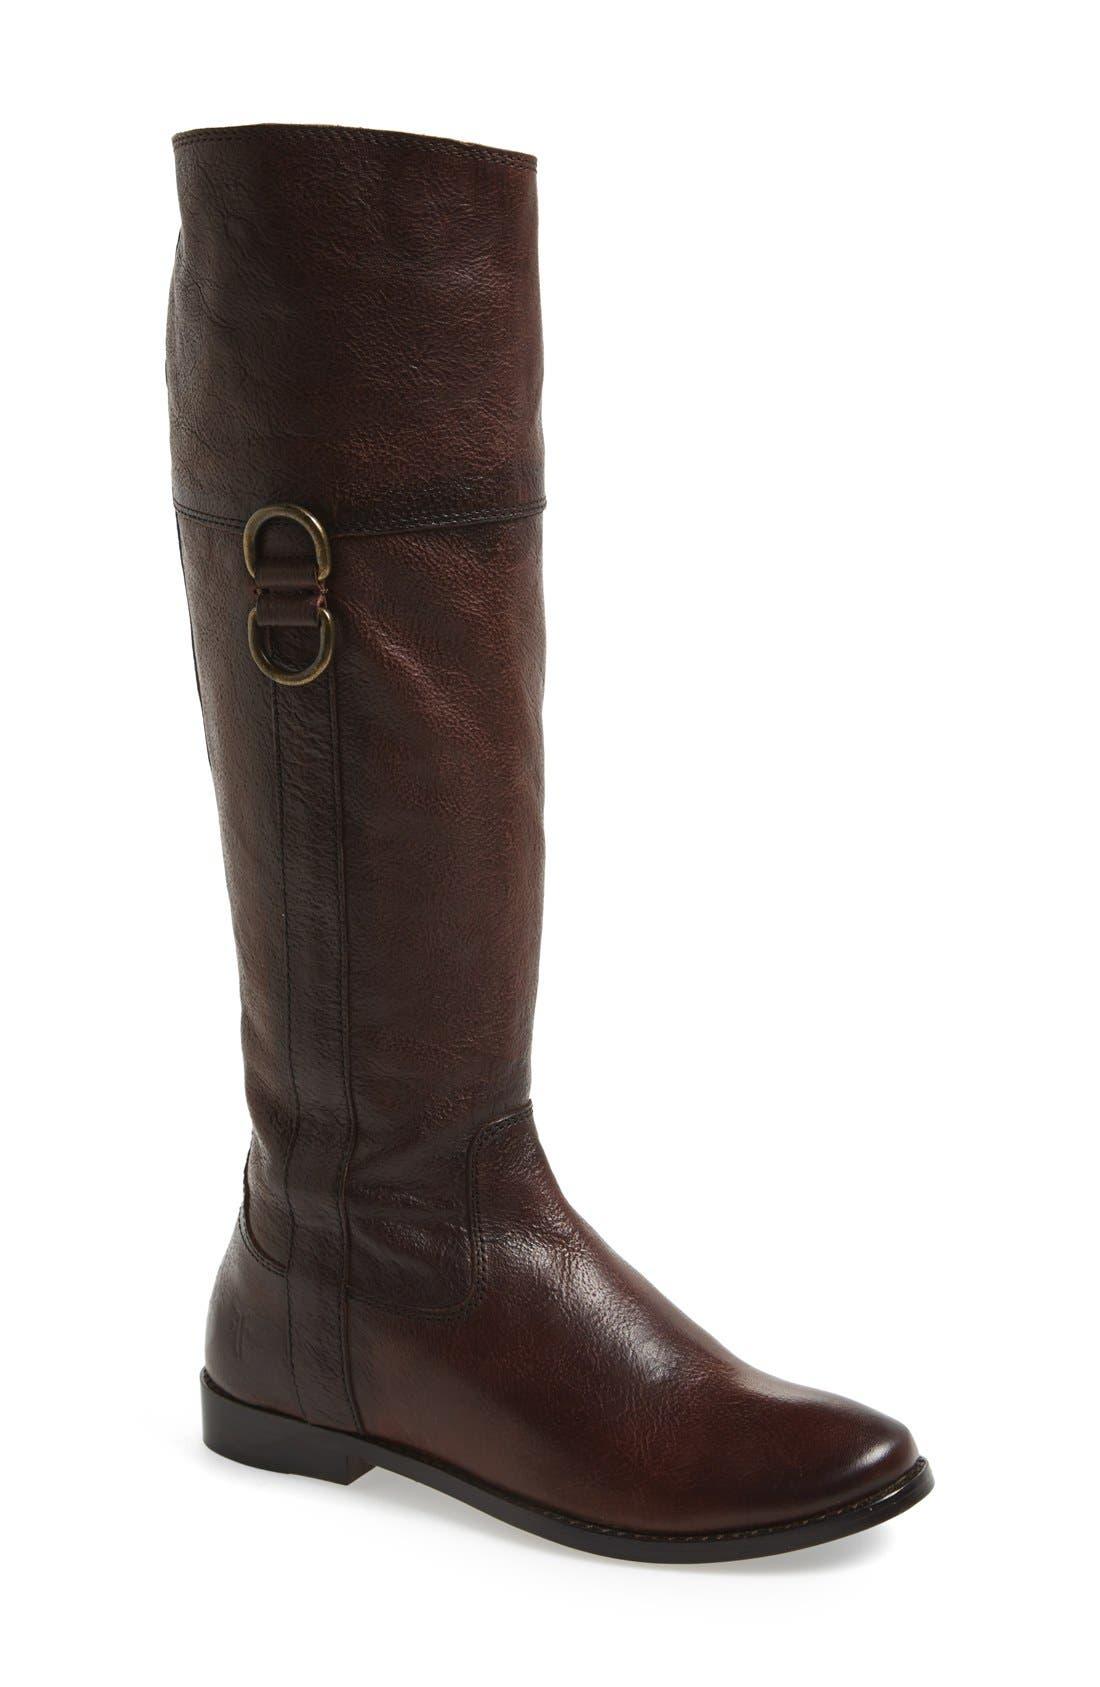 Alternate Image 1 Selected - Frye 'Anna' D Ring Boot (Women)